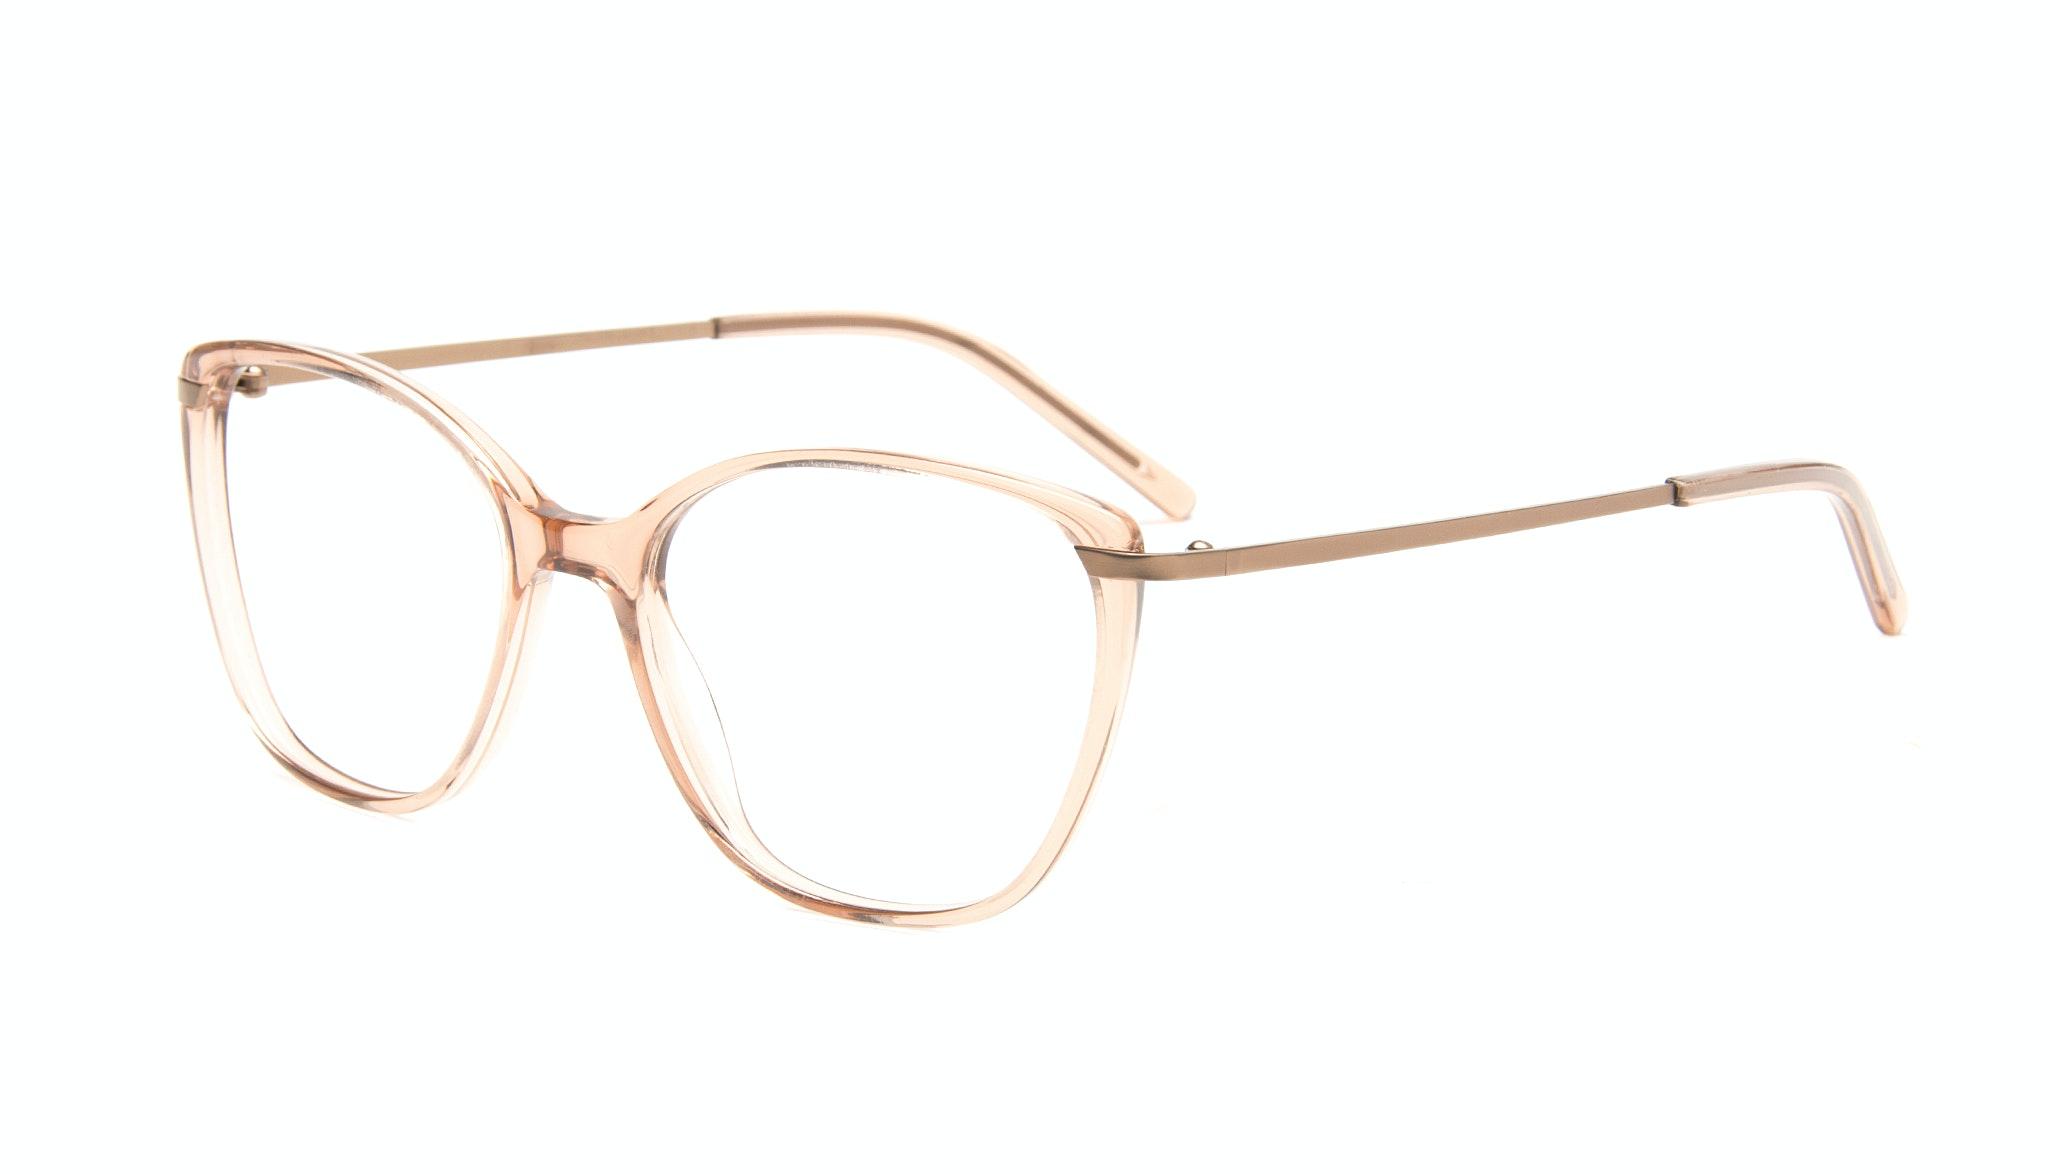 Affordable Fashion Glasses Cat Eye Rectangle Eyeglasses Women Illusion Rose Tilt